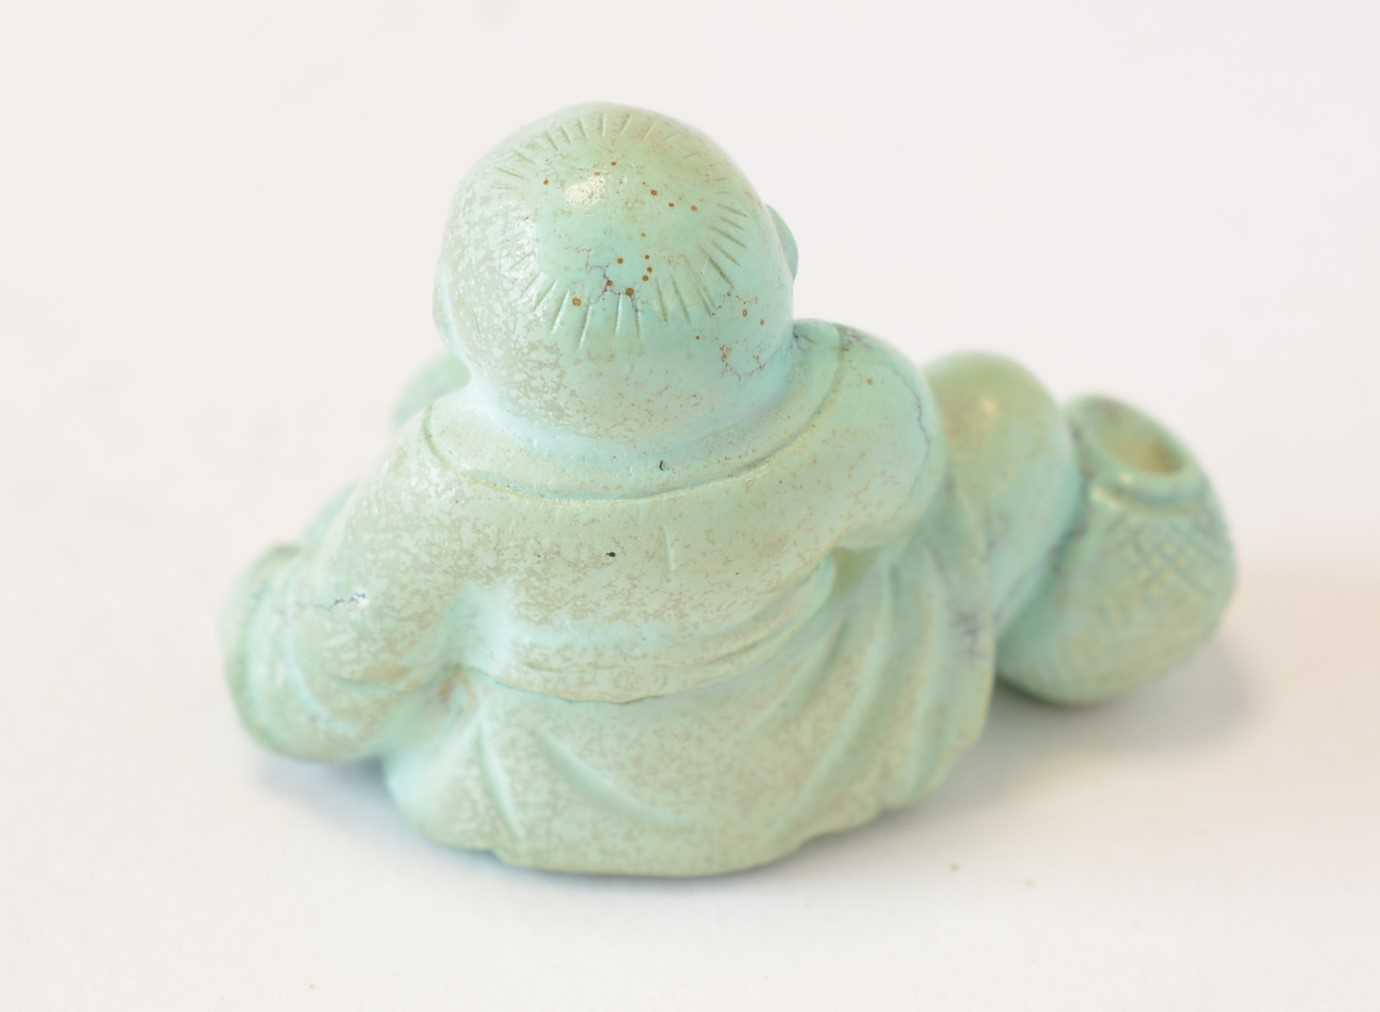 Chinese turquoise figure; jadeite pendant, hardstone cup - Image 8 of 27